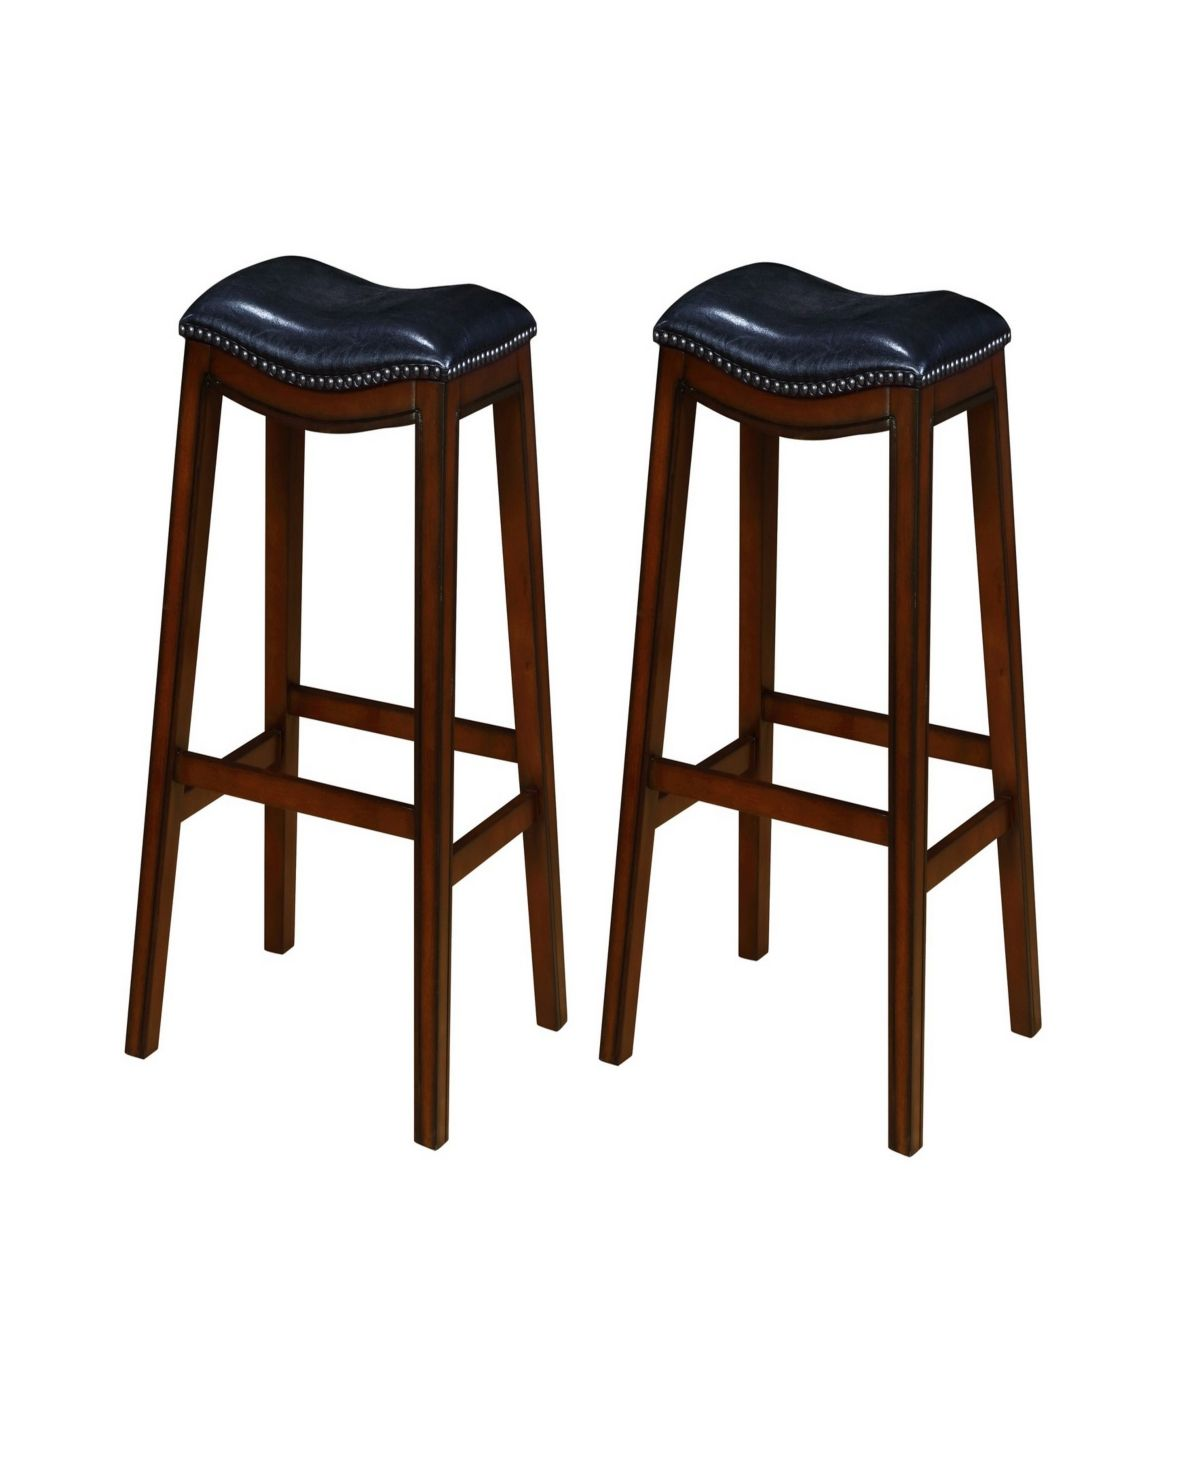 Coaster Home Furnishings Bonifacio Upholstered Backless Bar Stools